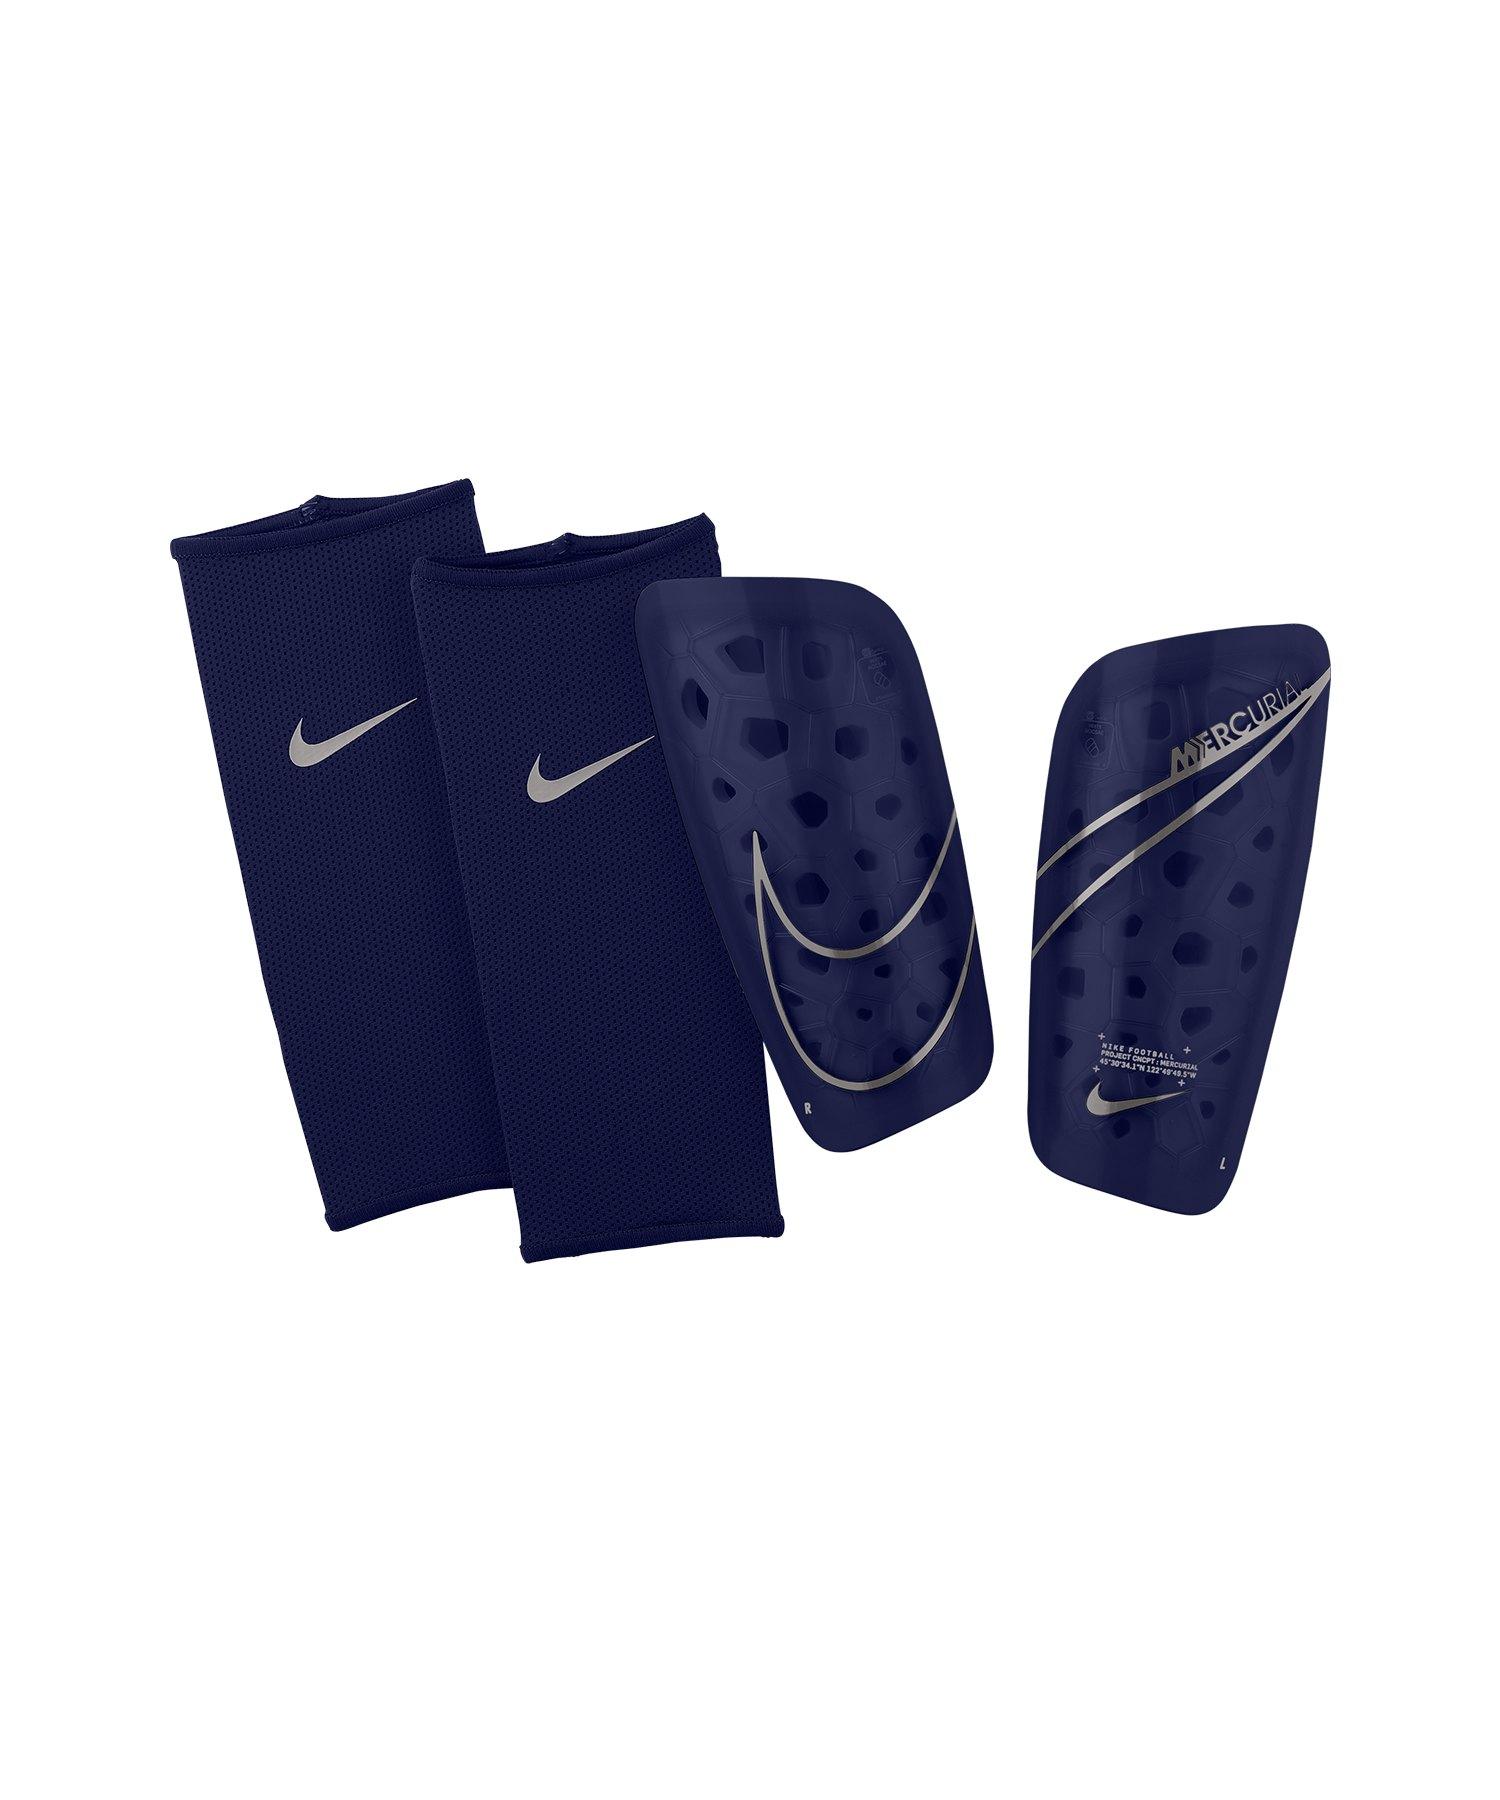 Nike Mercurial Lite Schienbeinschoner Blau F492 - blau